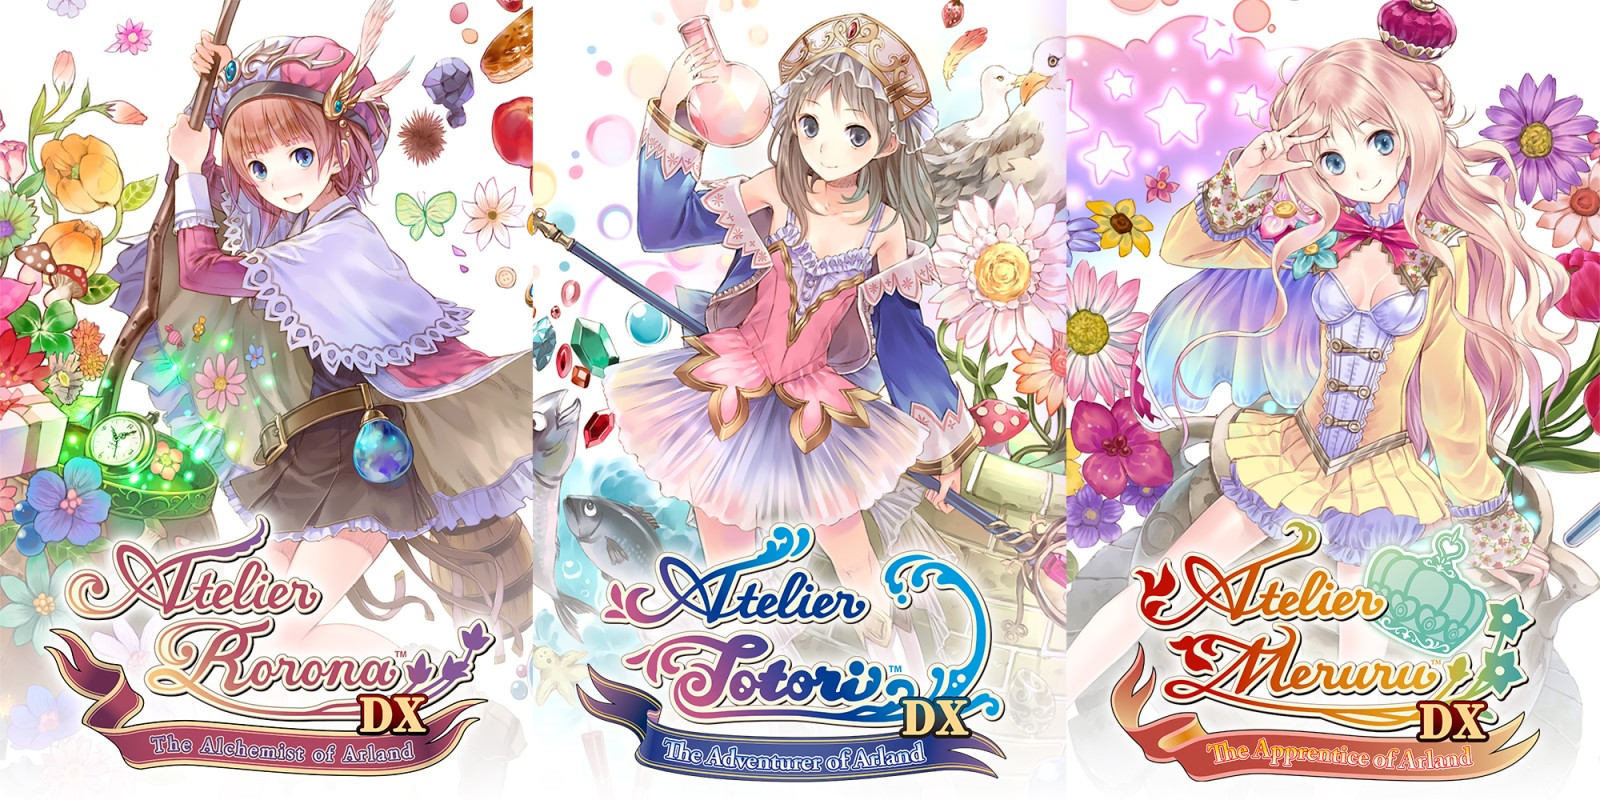 Atelier Arland series Deluxe Pack